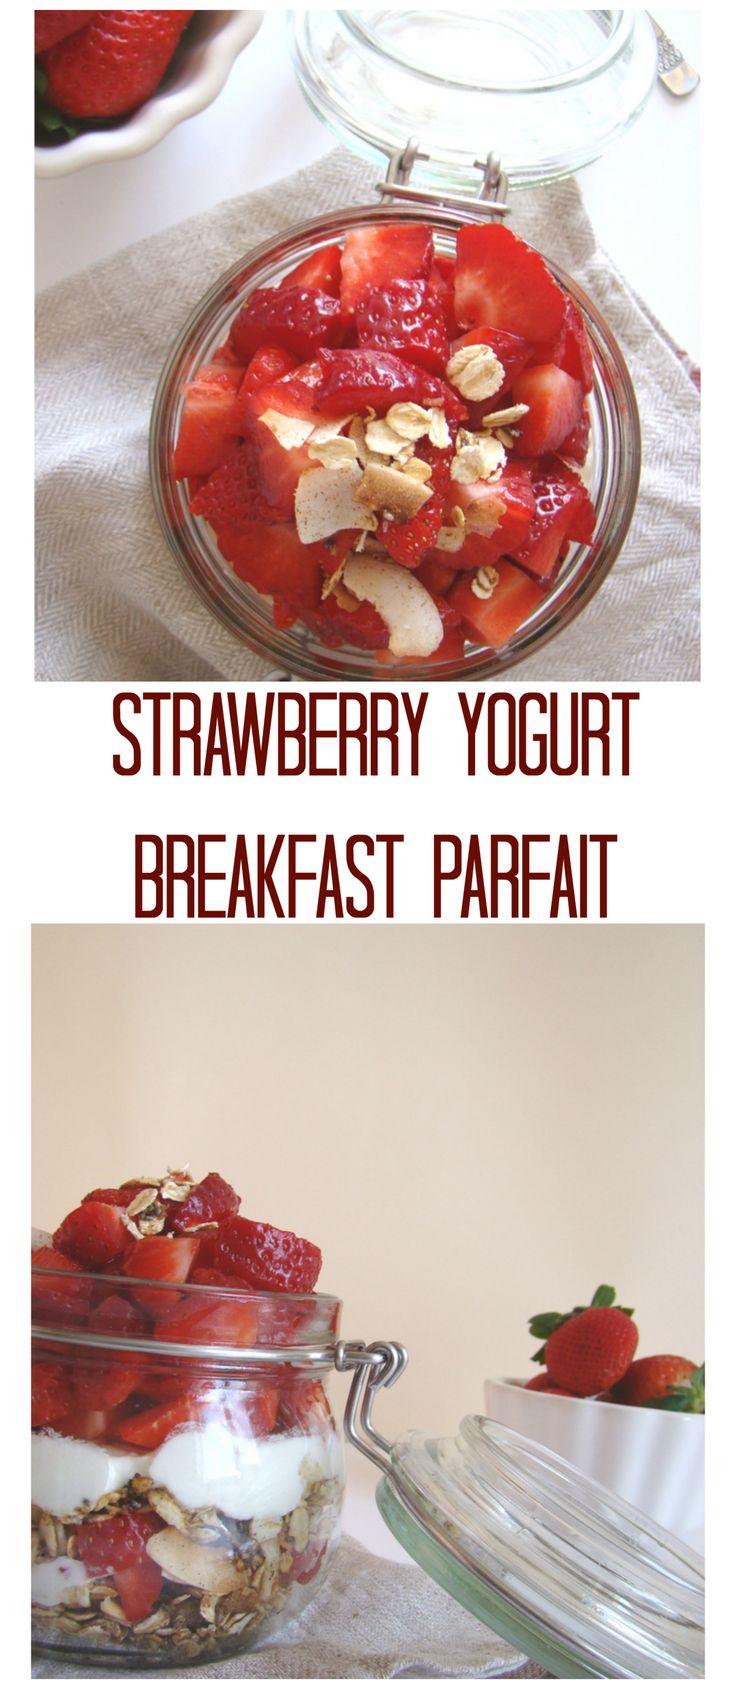 Strawberry Yogurt Breakfast Parfait